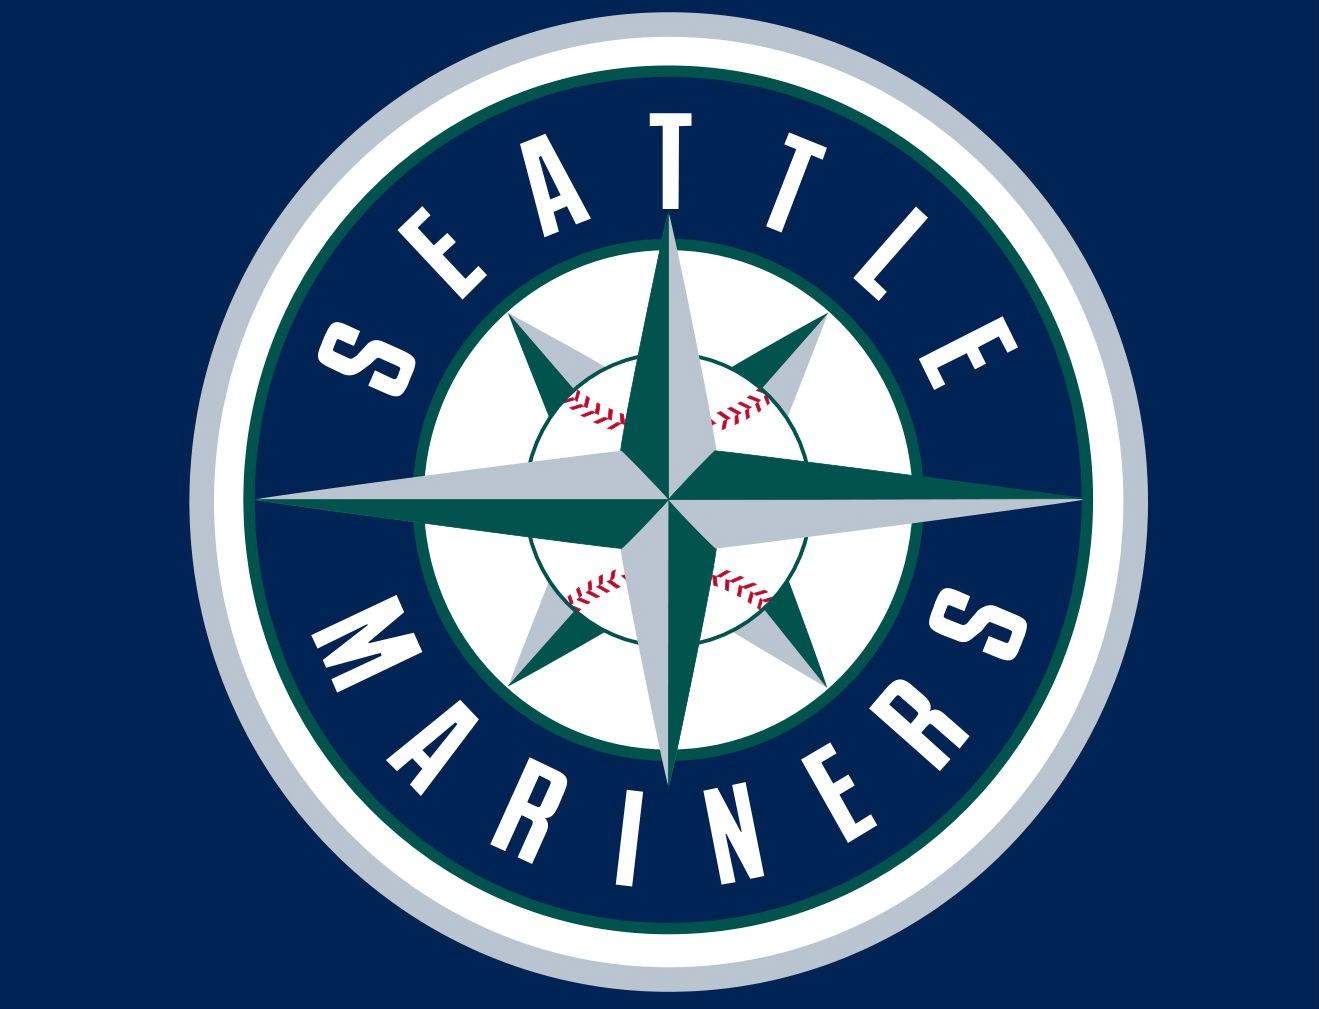 Mariners beat Twins 14-3.